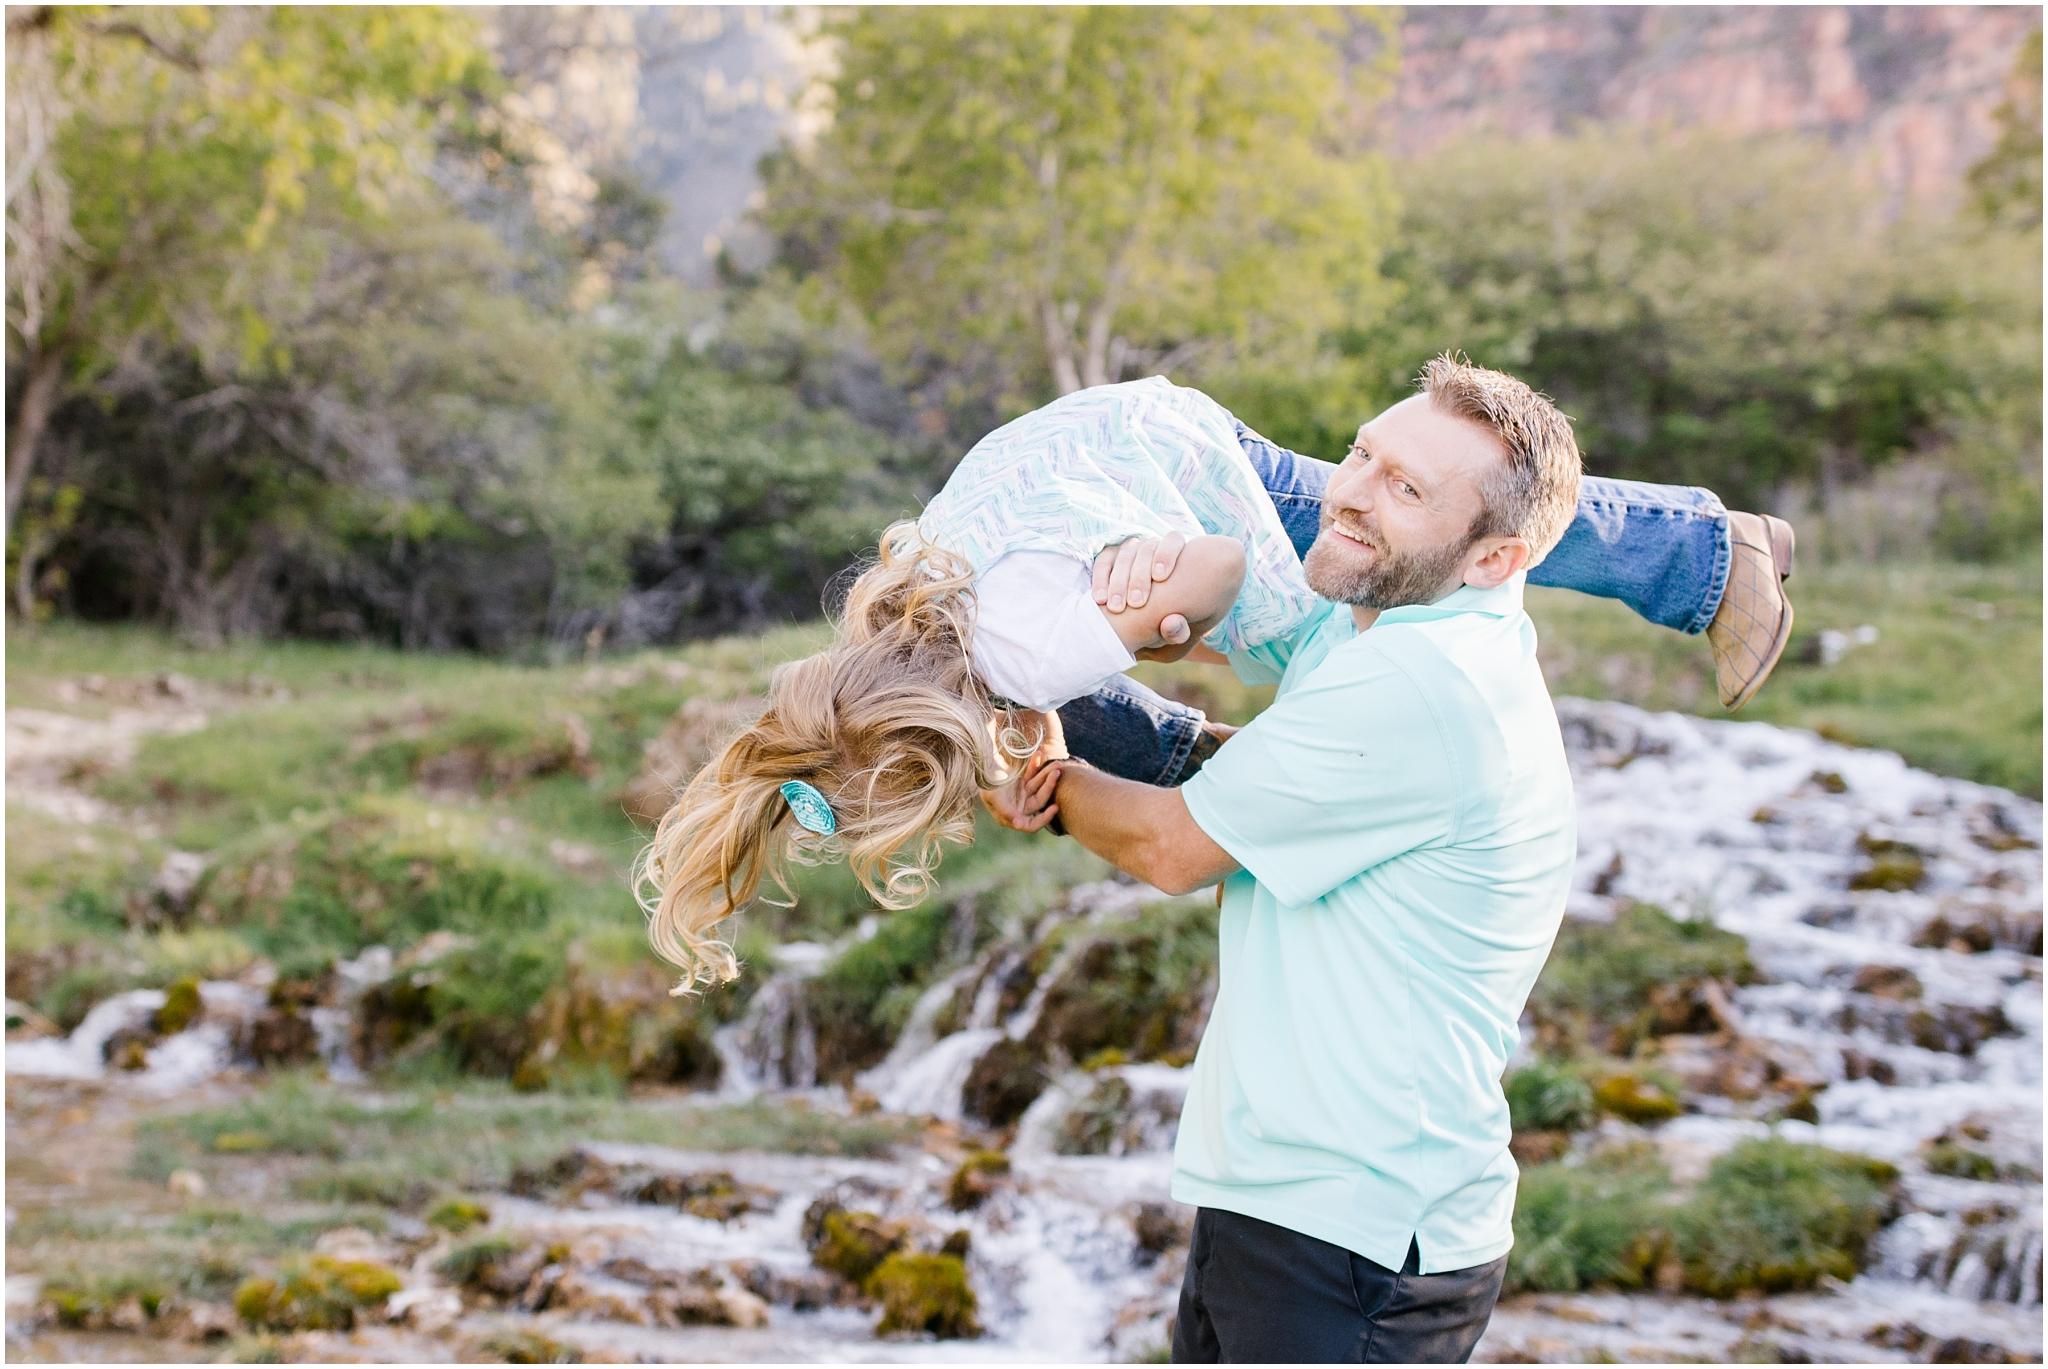 Bagley-77_Lizzie-B-Imagery-Utah-Family-Photographer-Central-Utah-Photographer-Utah-County-Extended-Family.jpg